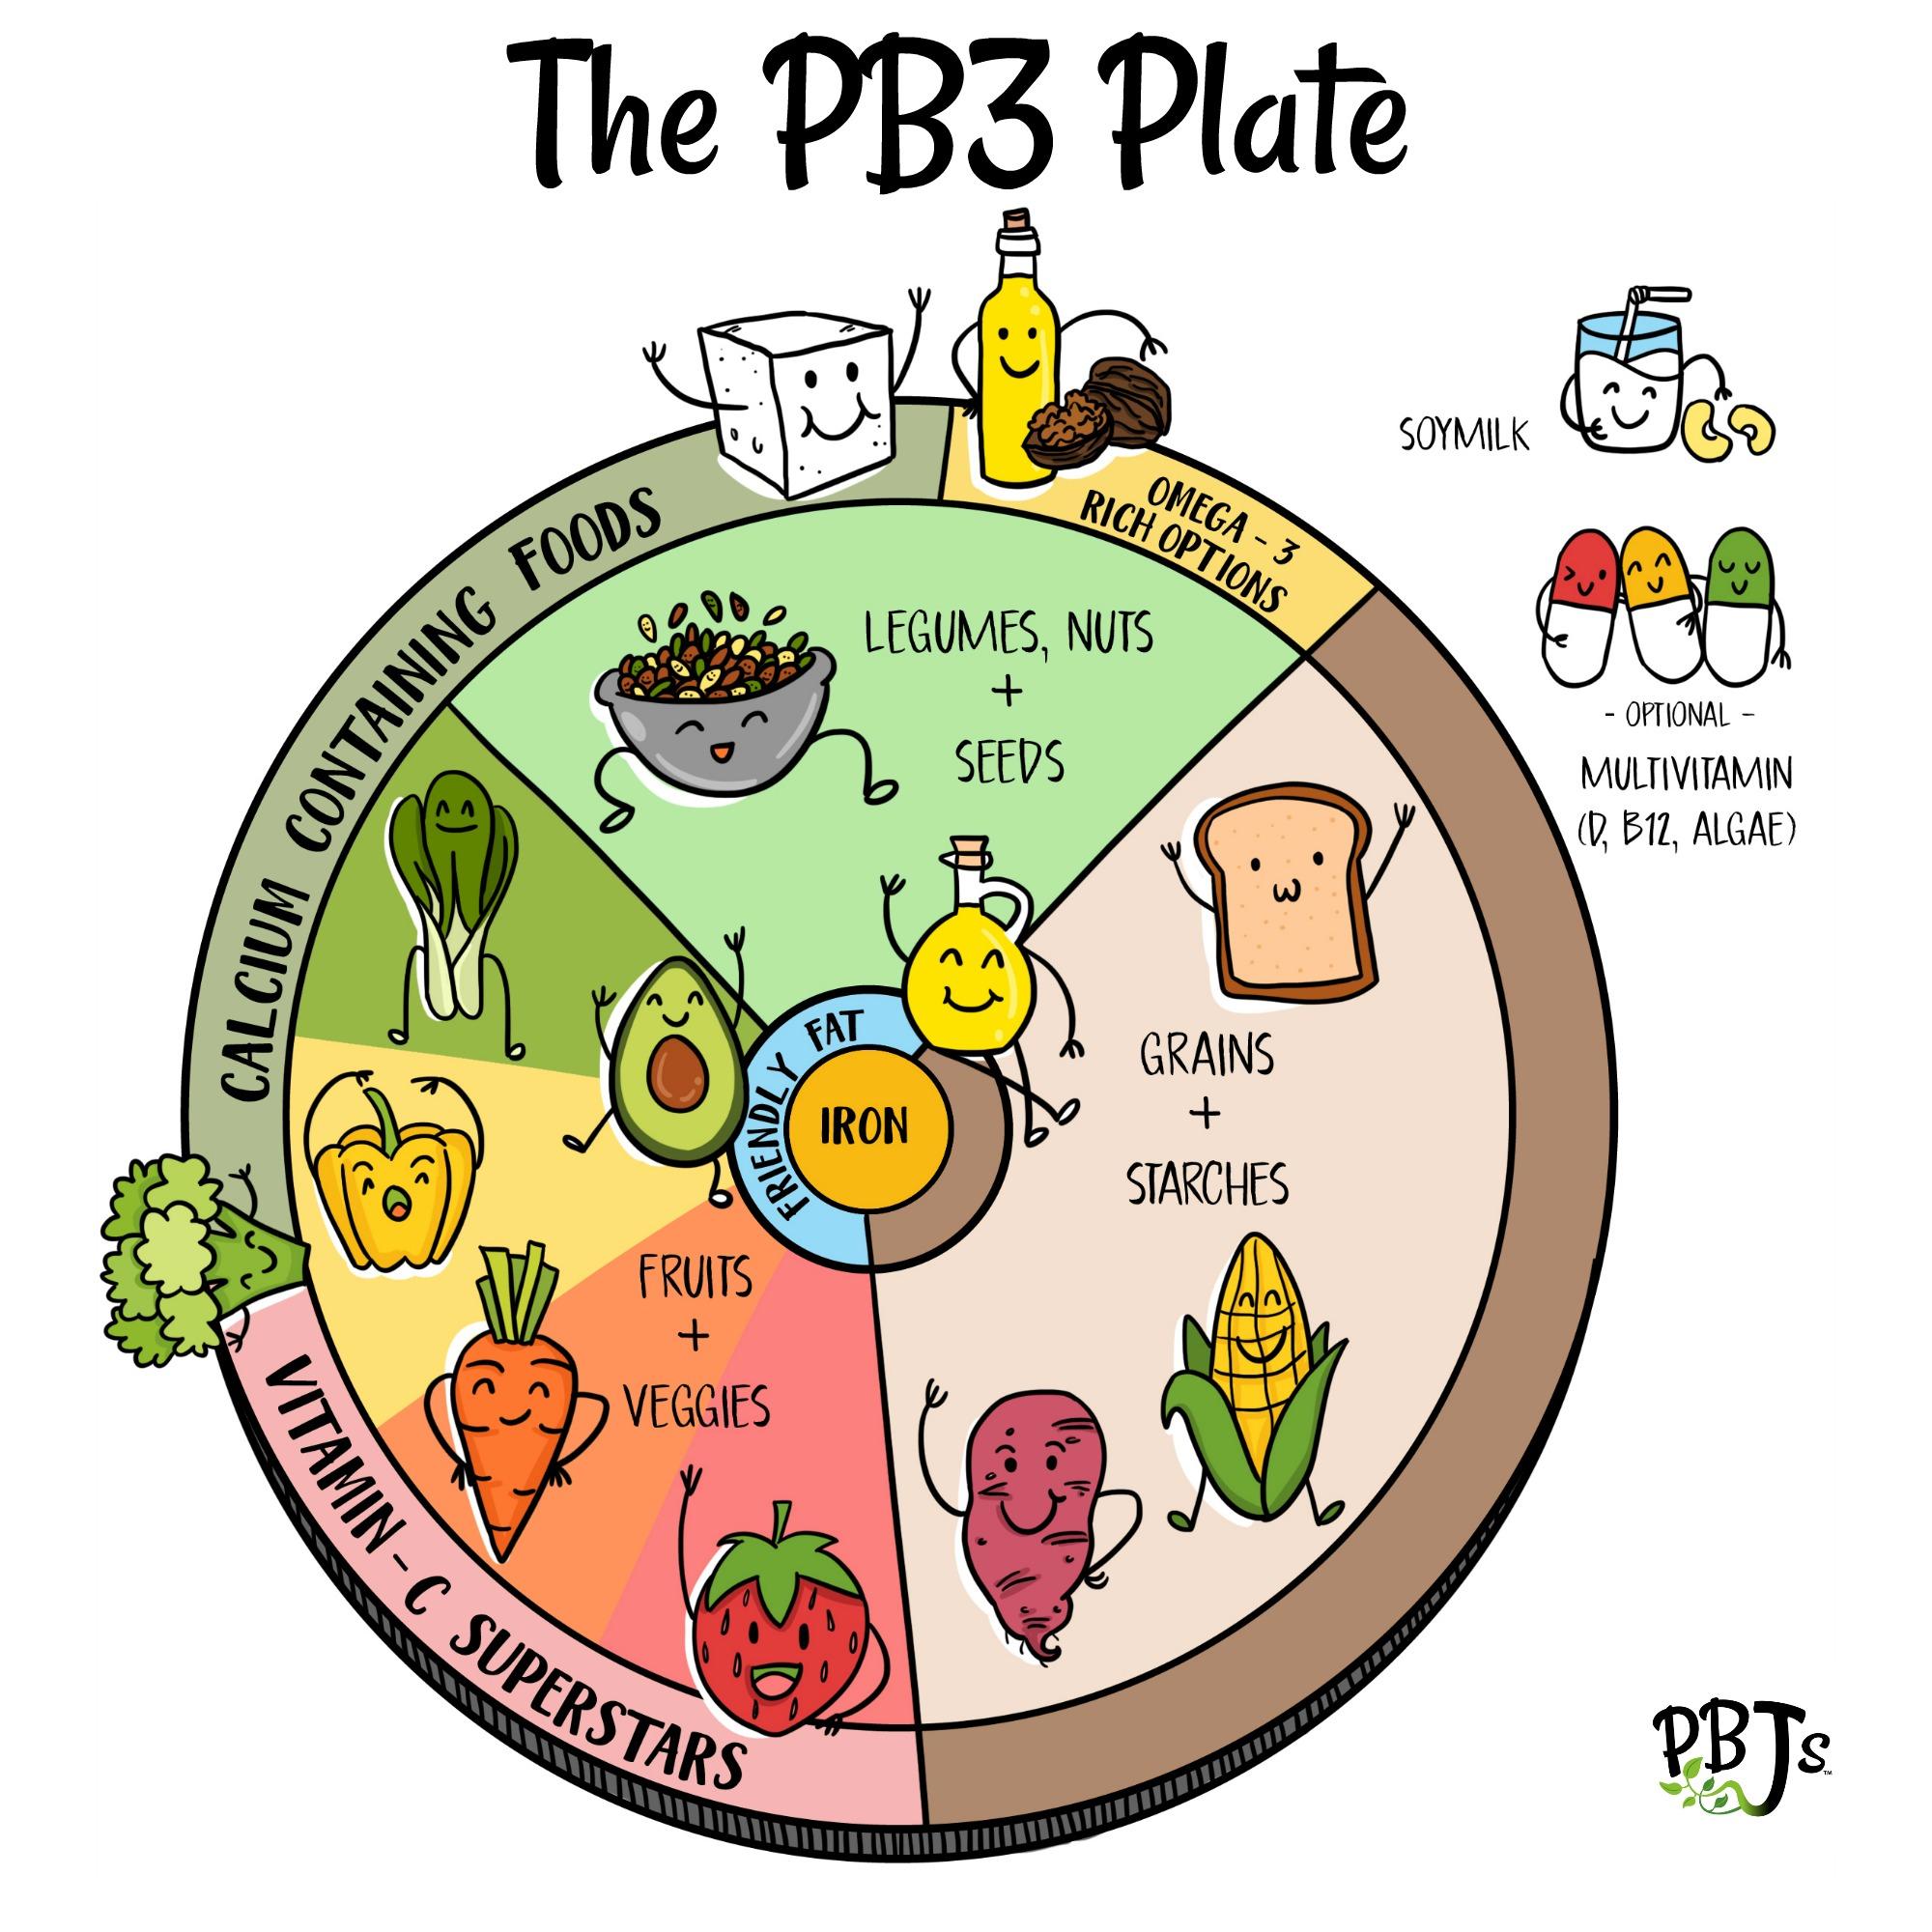 PB3-Plate-with-Logo.jpg